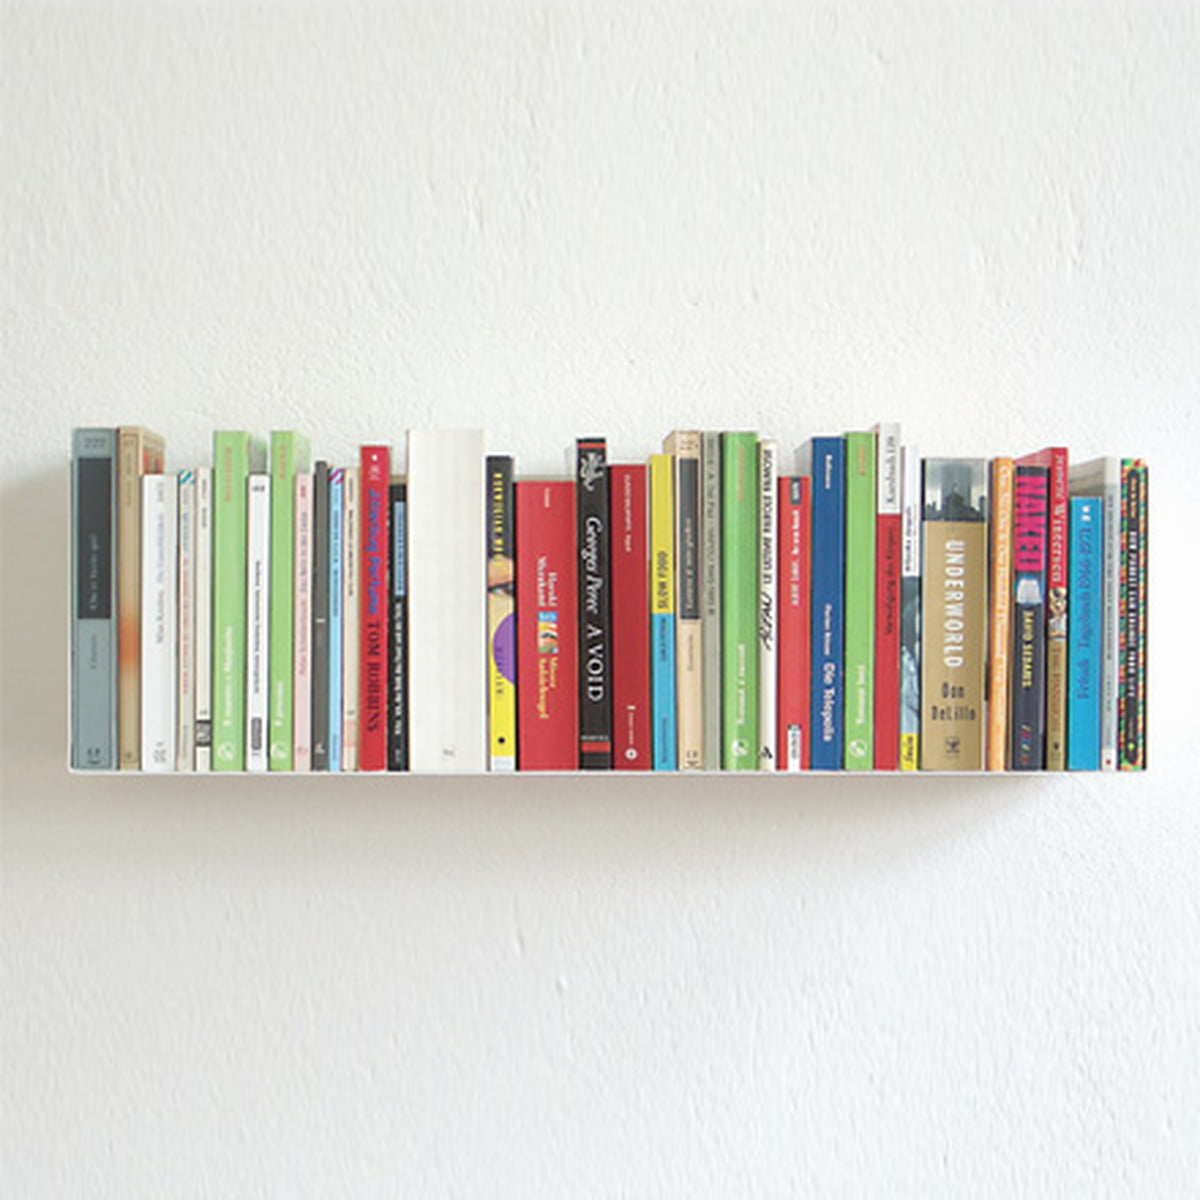 Linea1 A Book Shelf